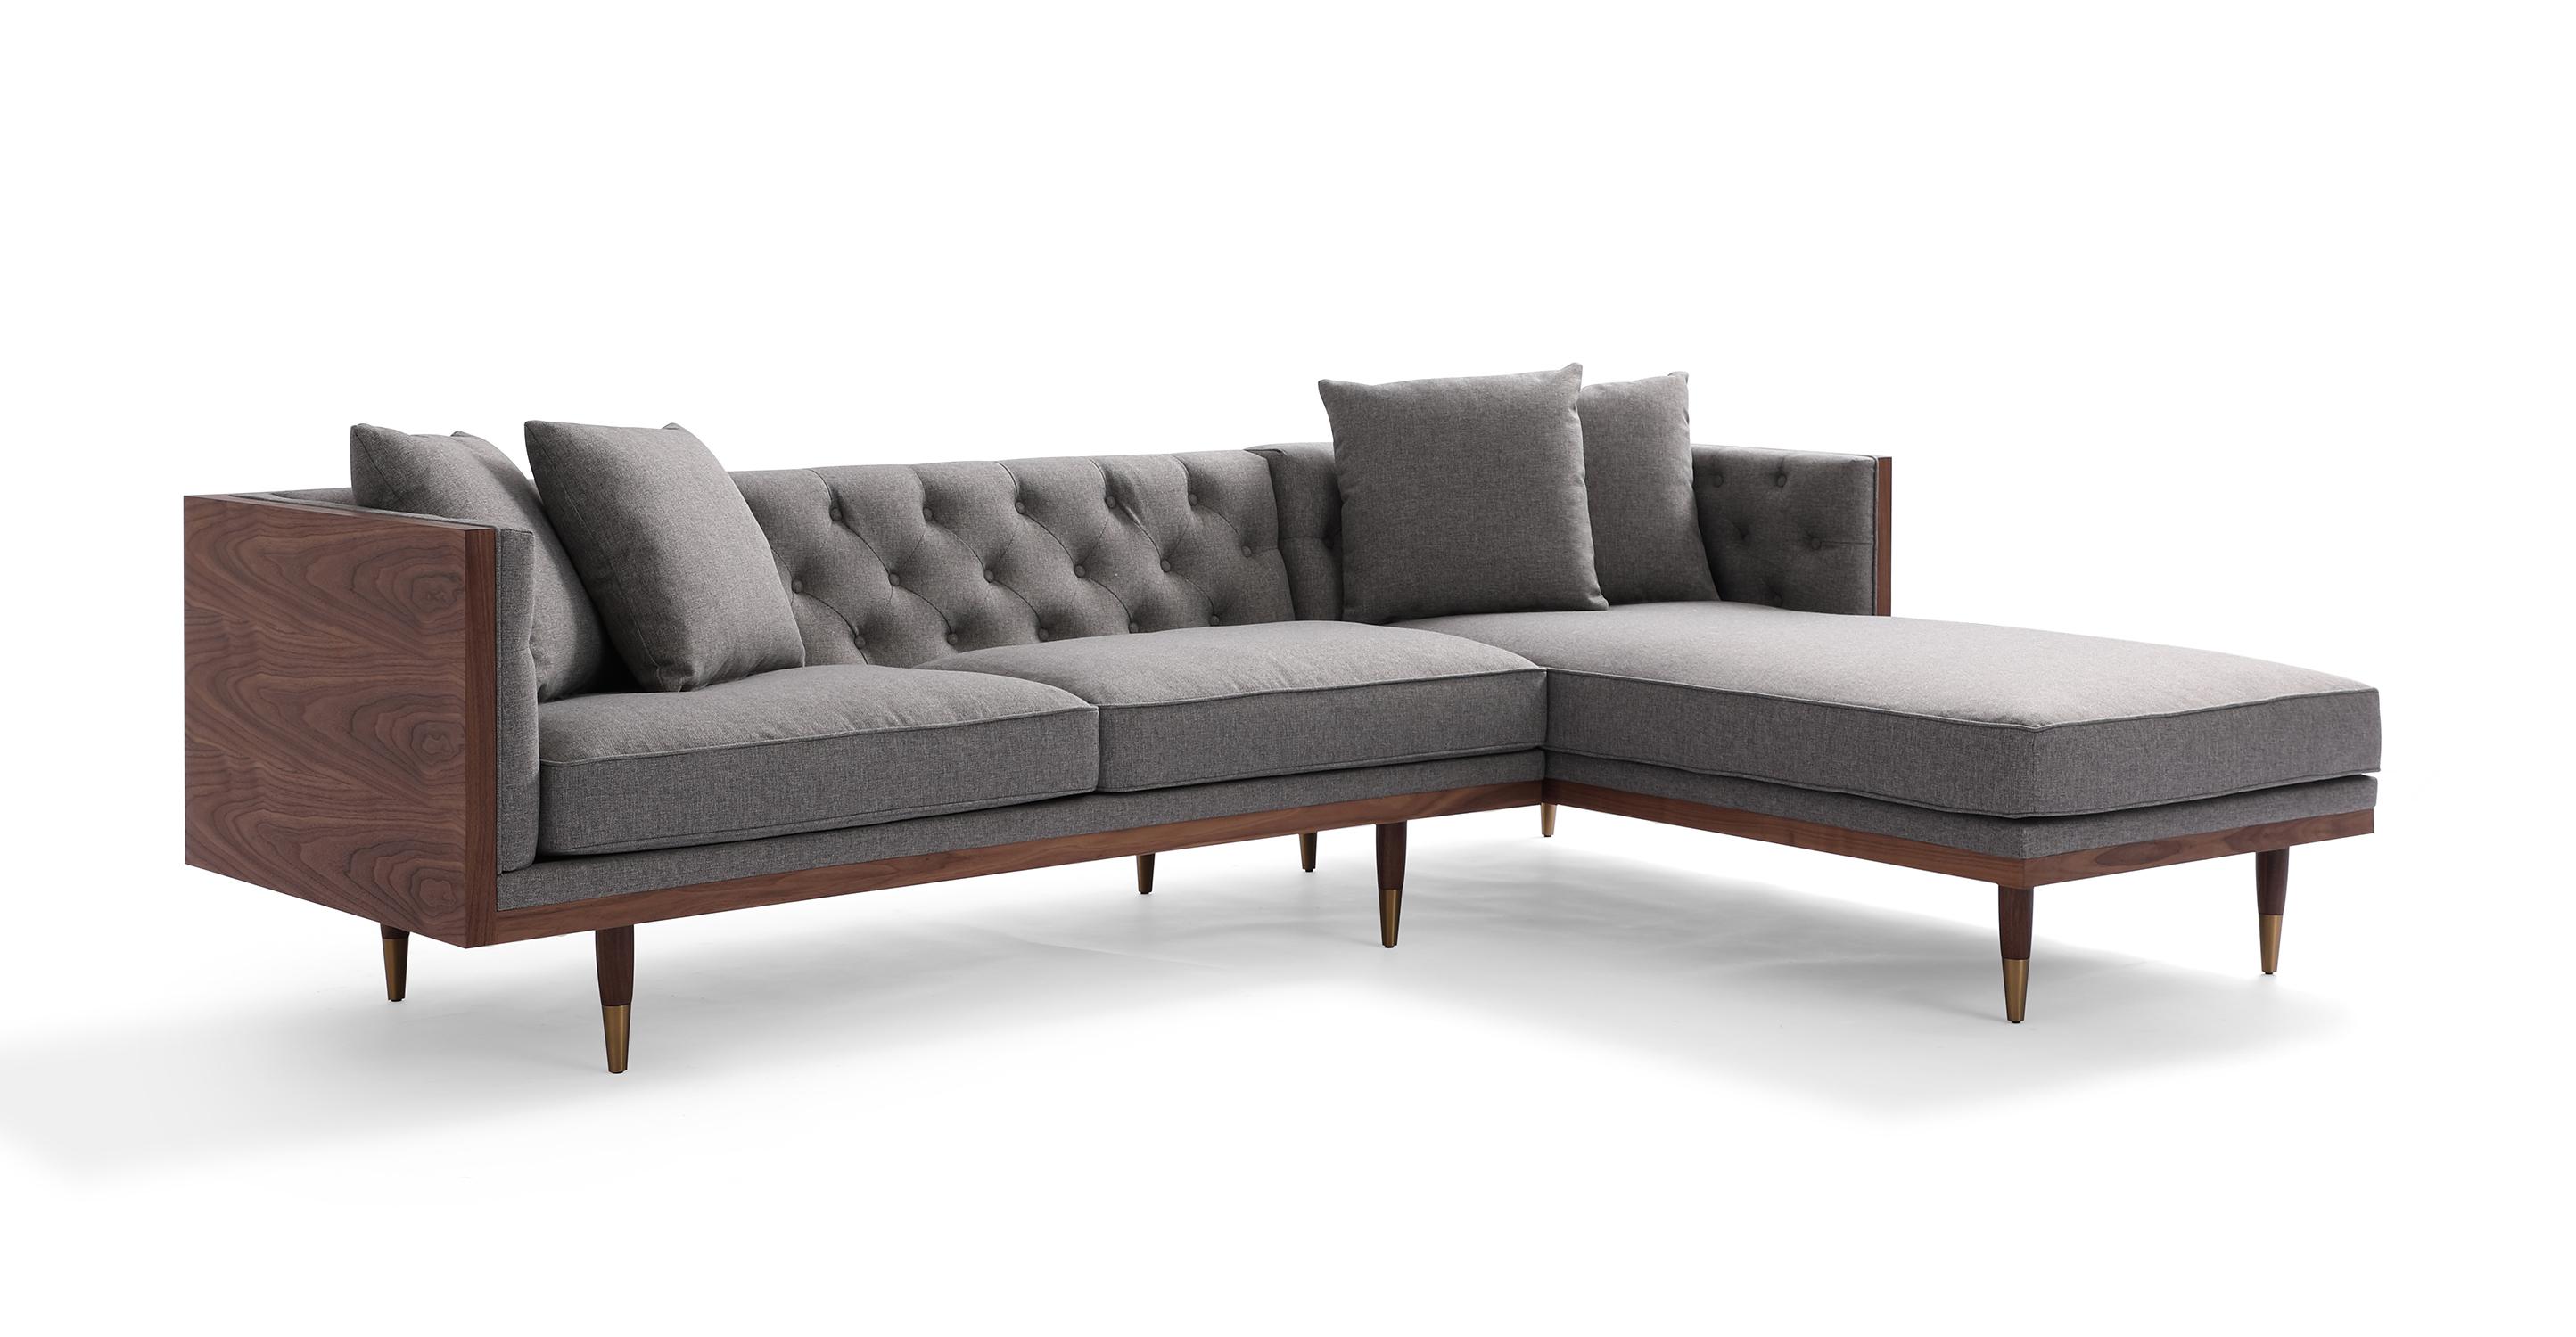 "Woodrow Neo 99"" Fabric Sofa Sectional Right, Walnut/Eames Grey"